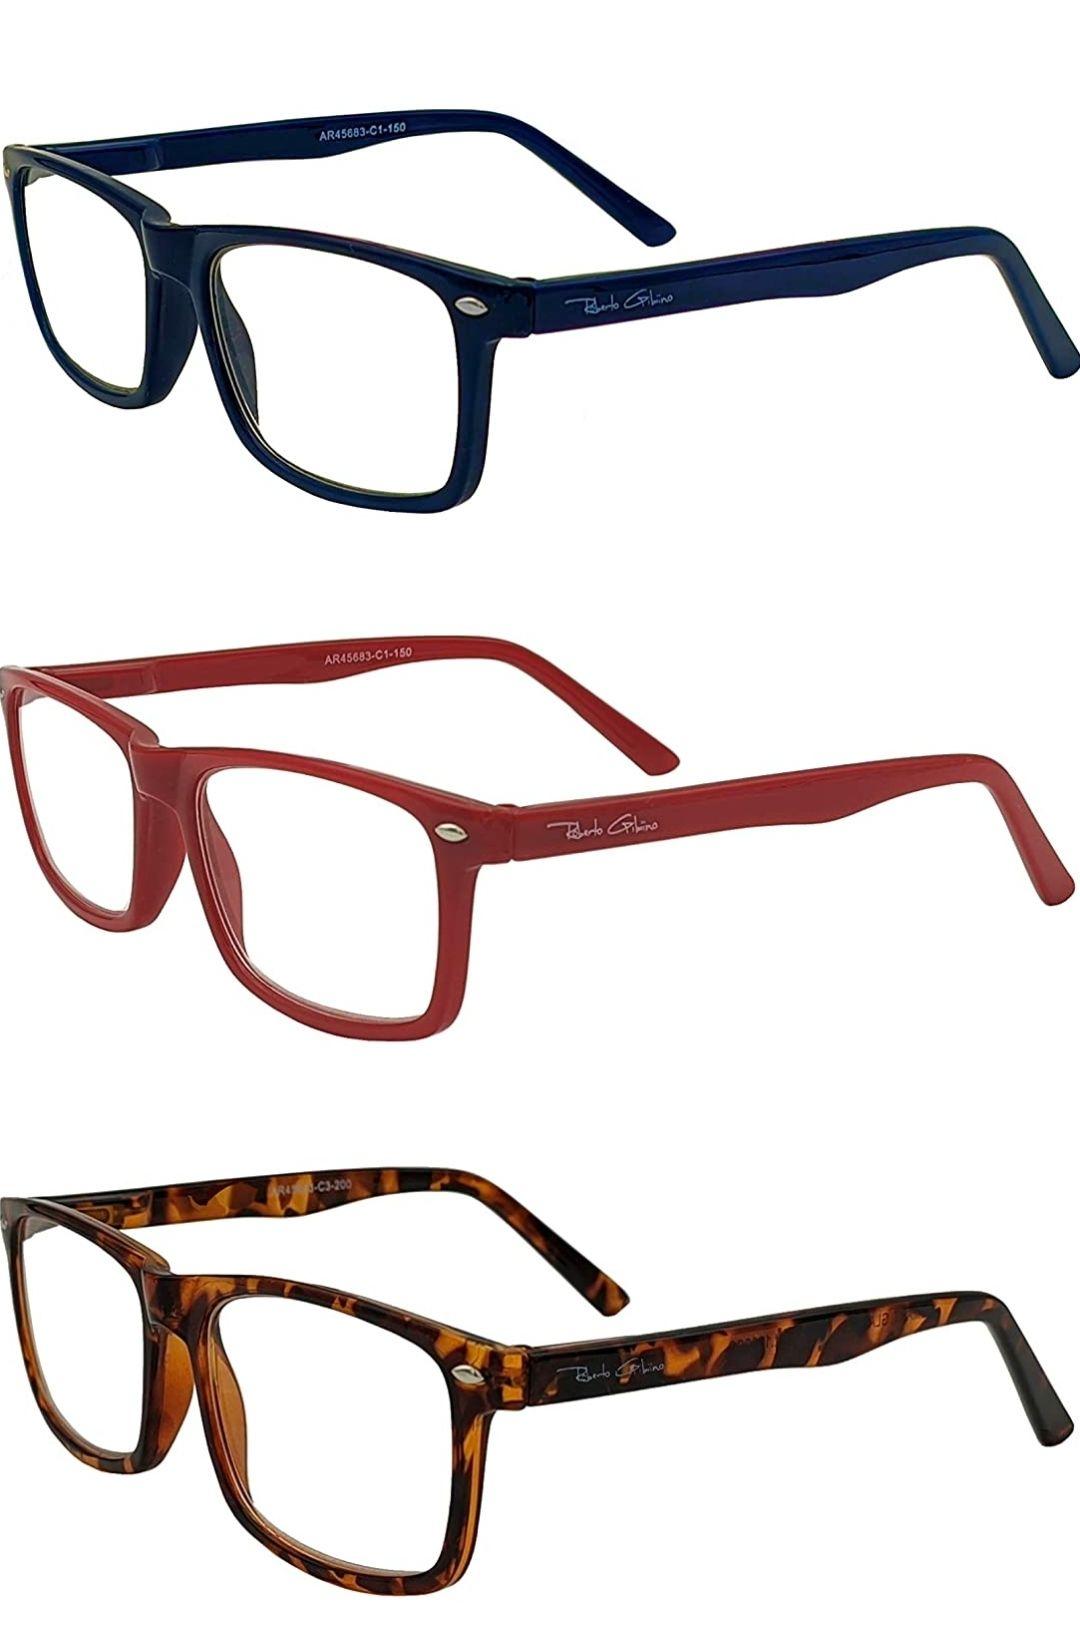 Gafas de lectura para la presbicia (3 colores) Modelo SMART GLASSES 2021 Marco de moda pulido Diseño rectangular